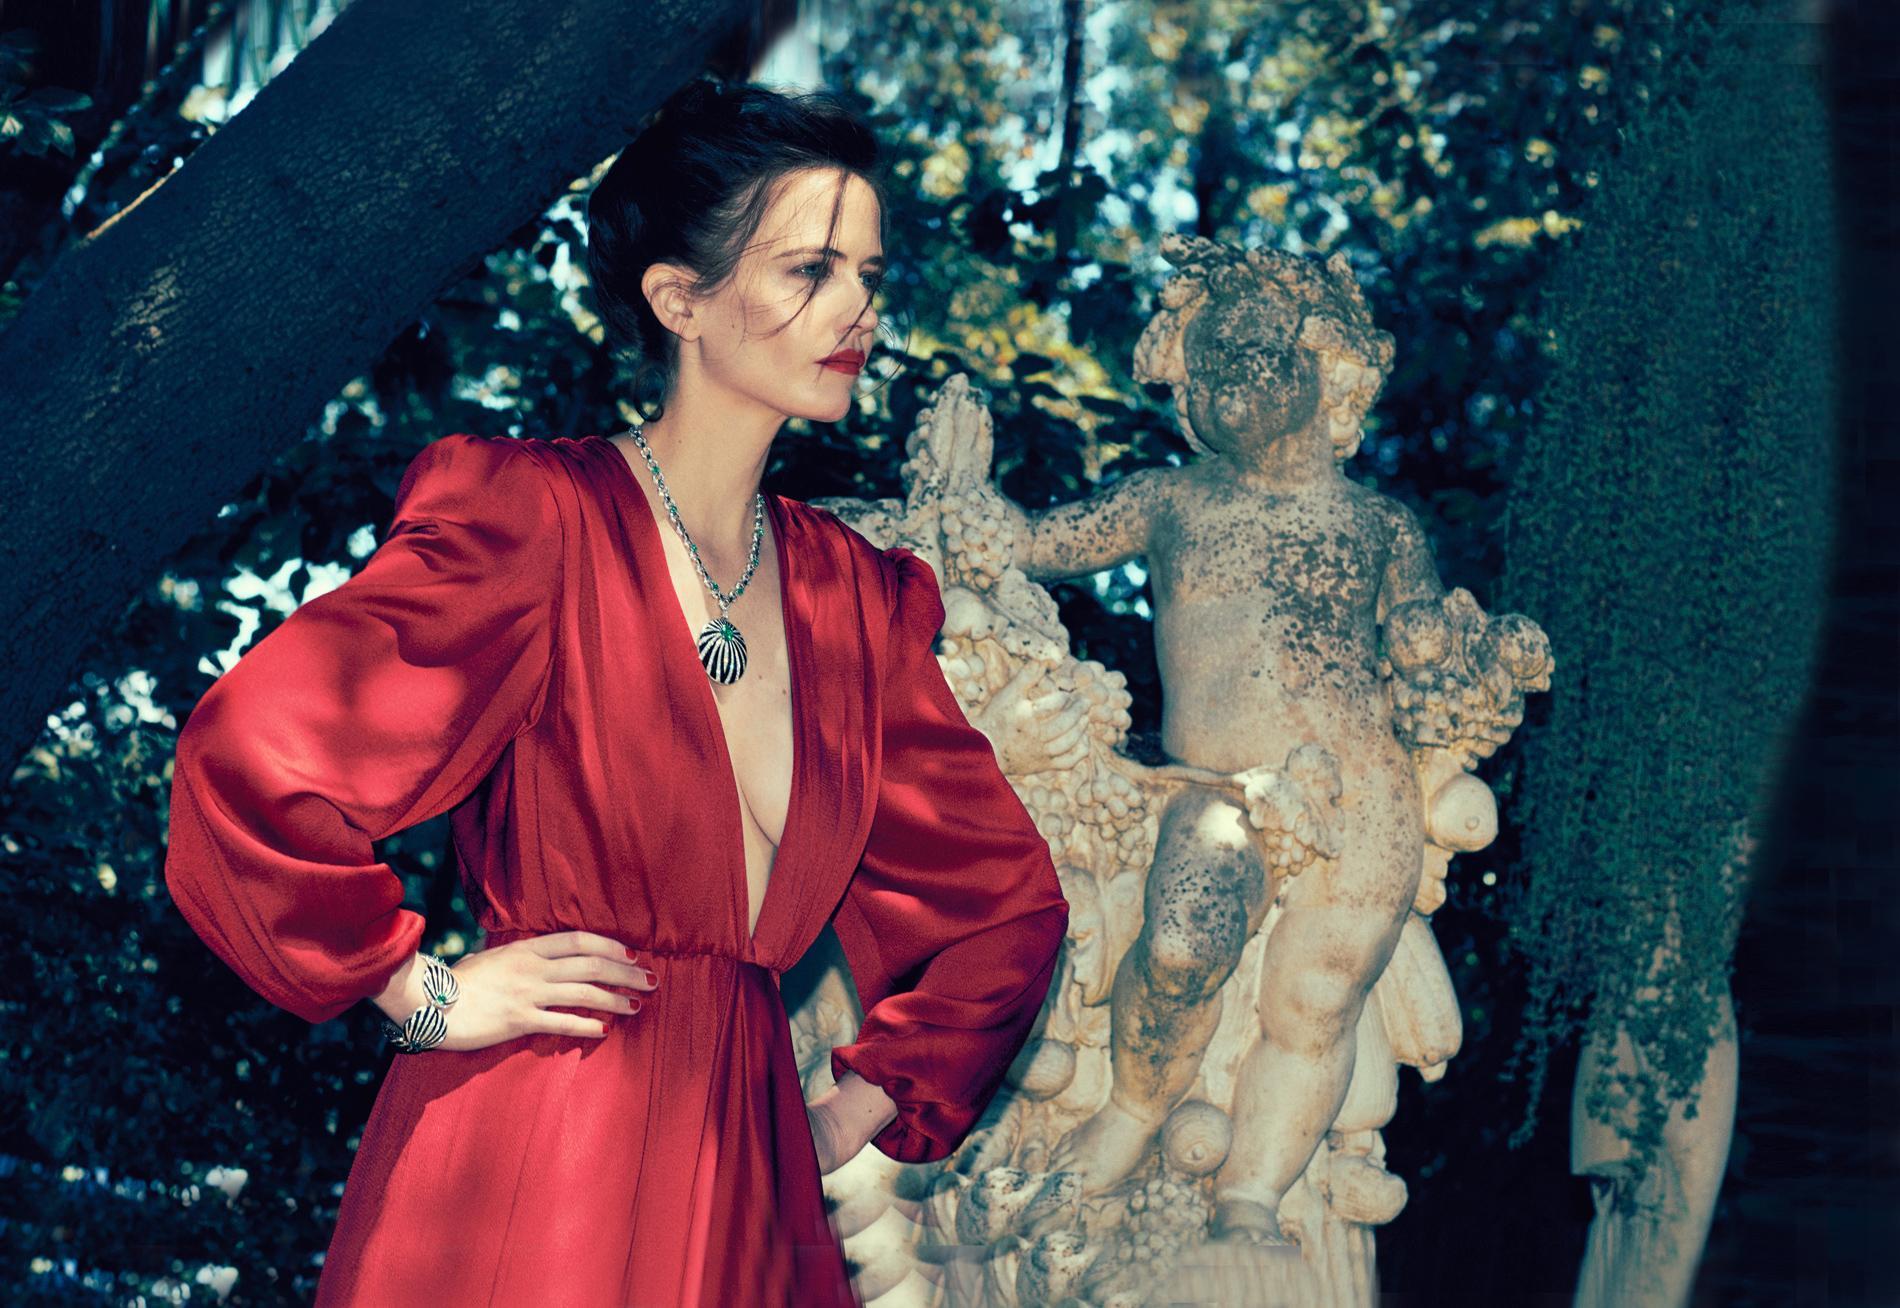 Eva Green, lady in red